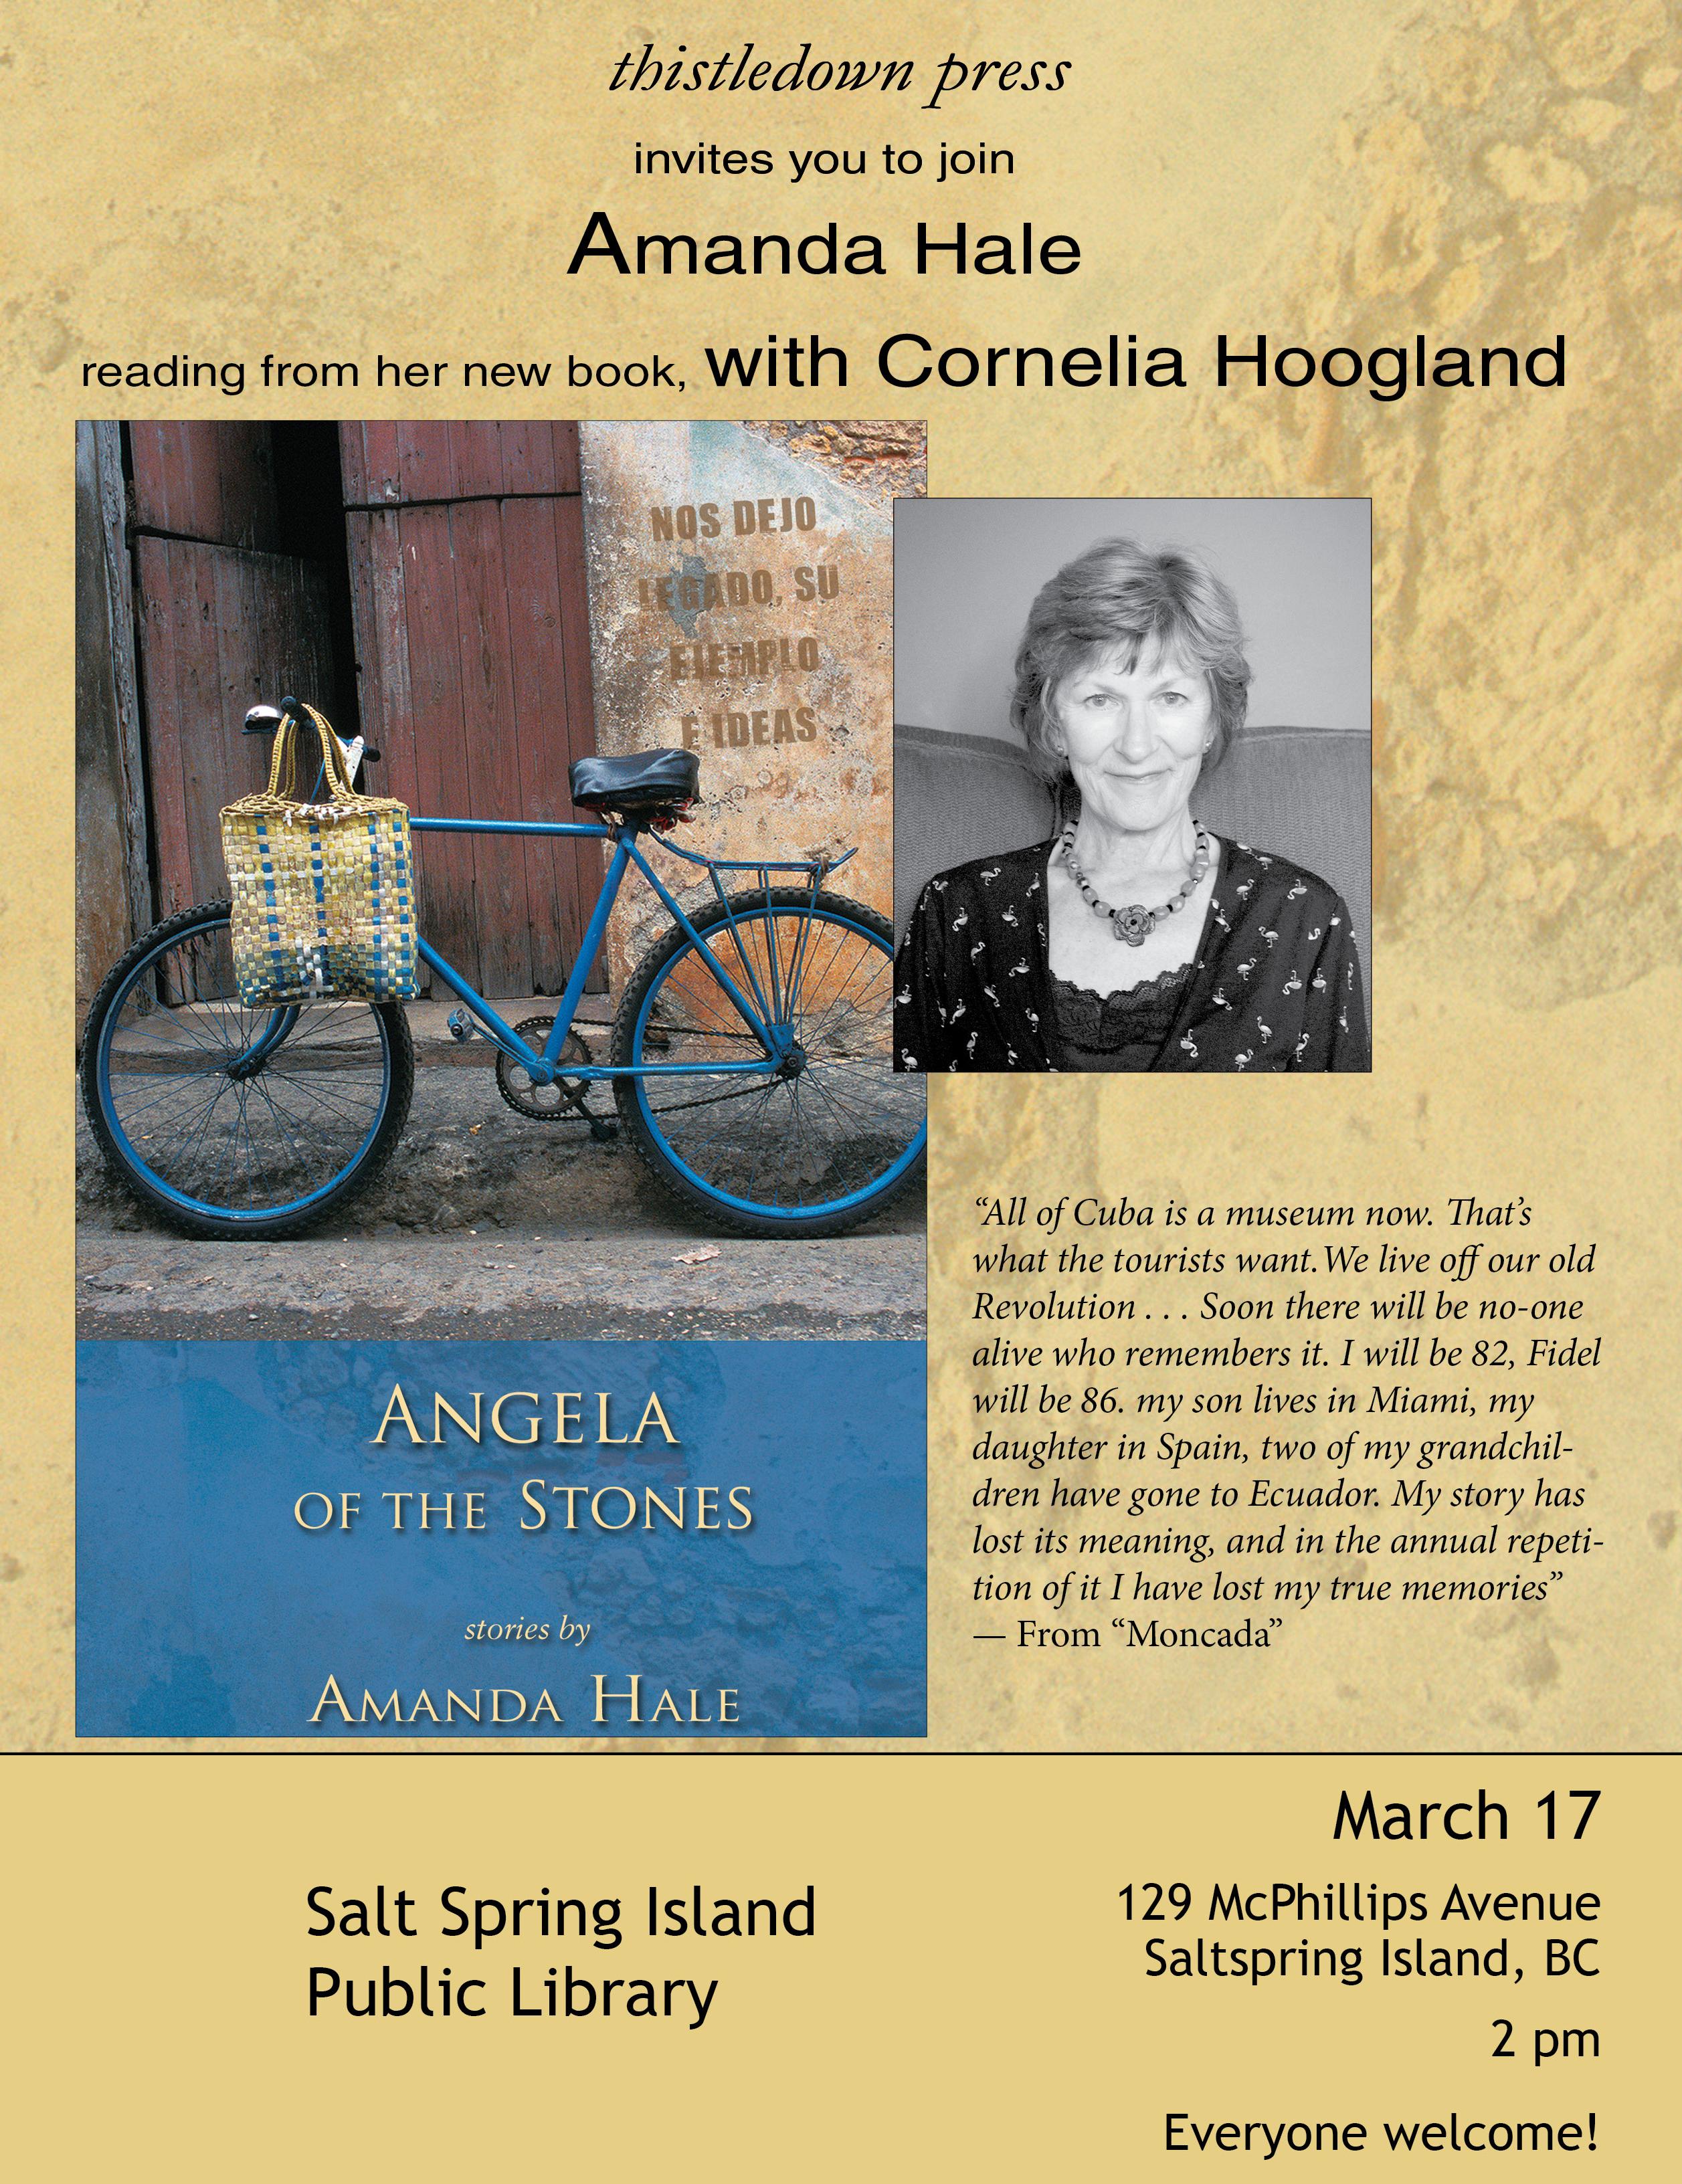 Amanda Hale event